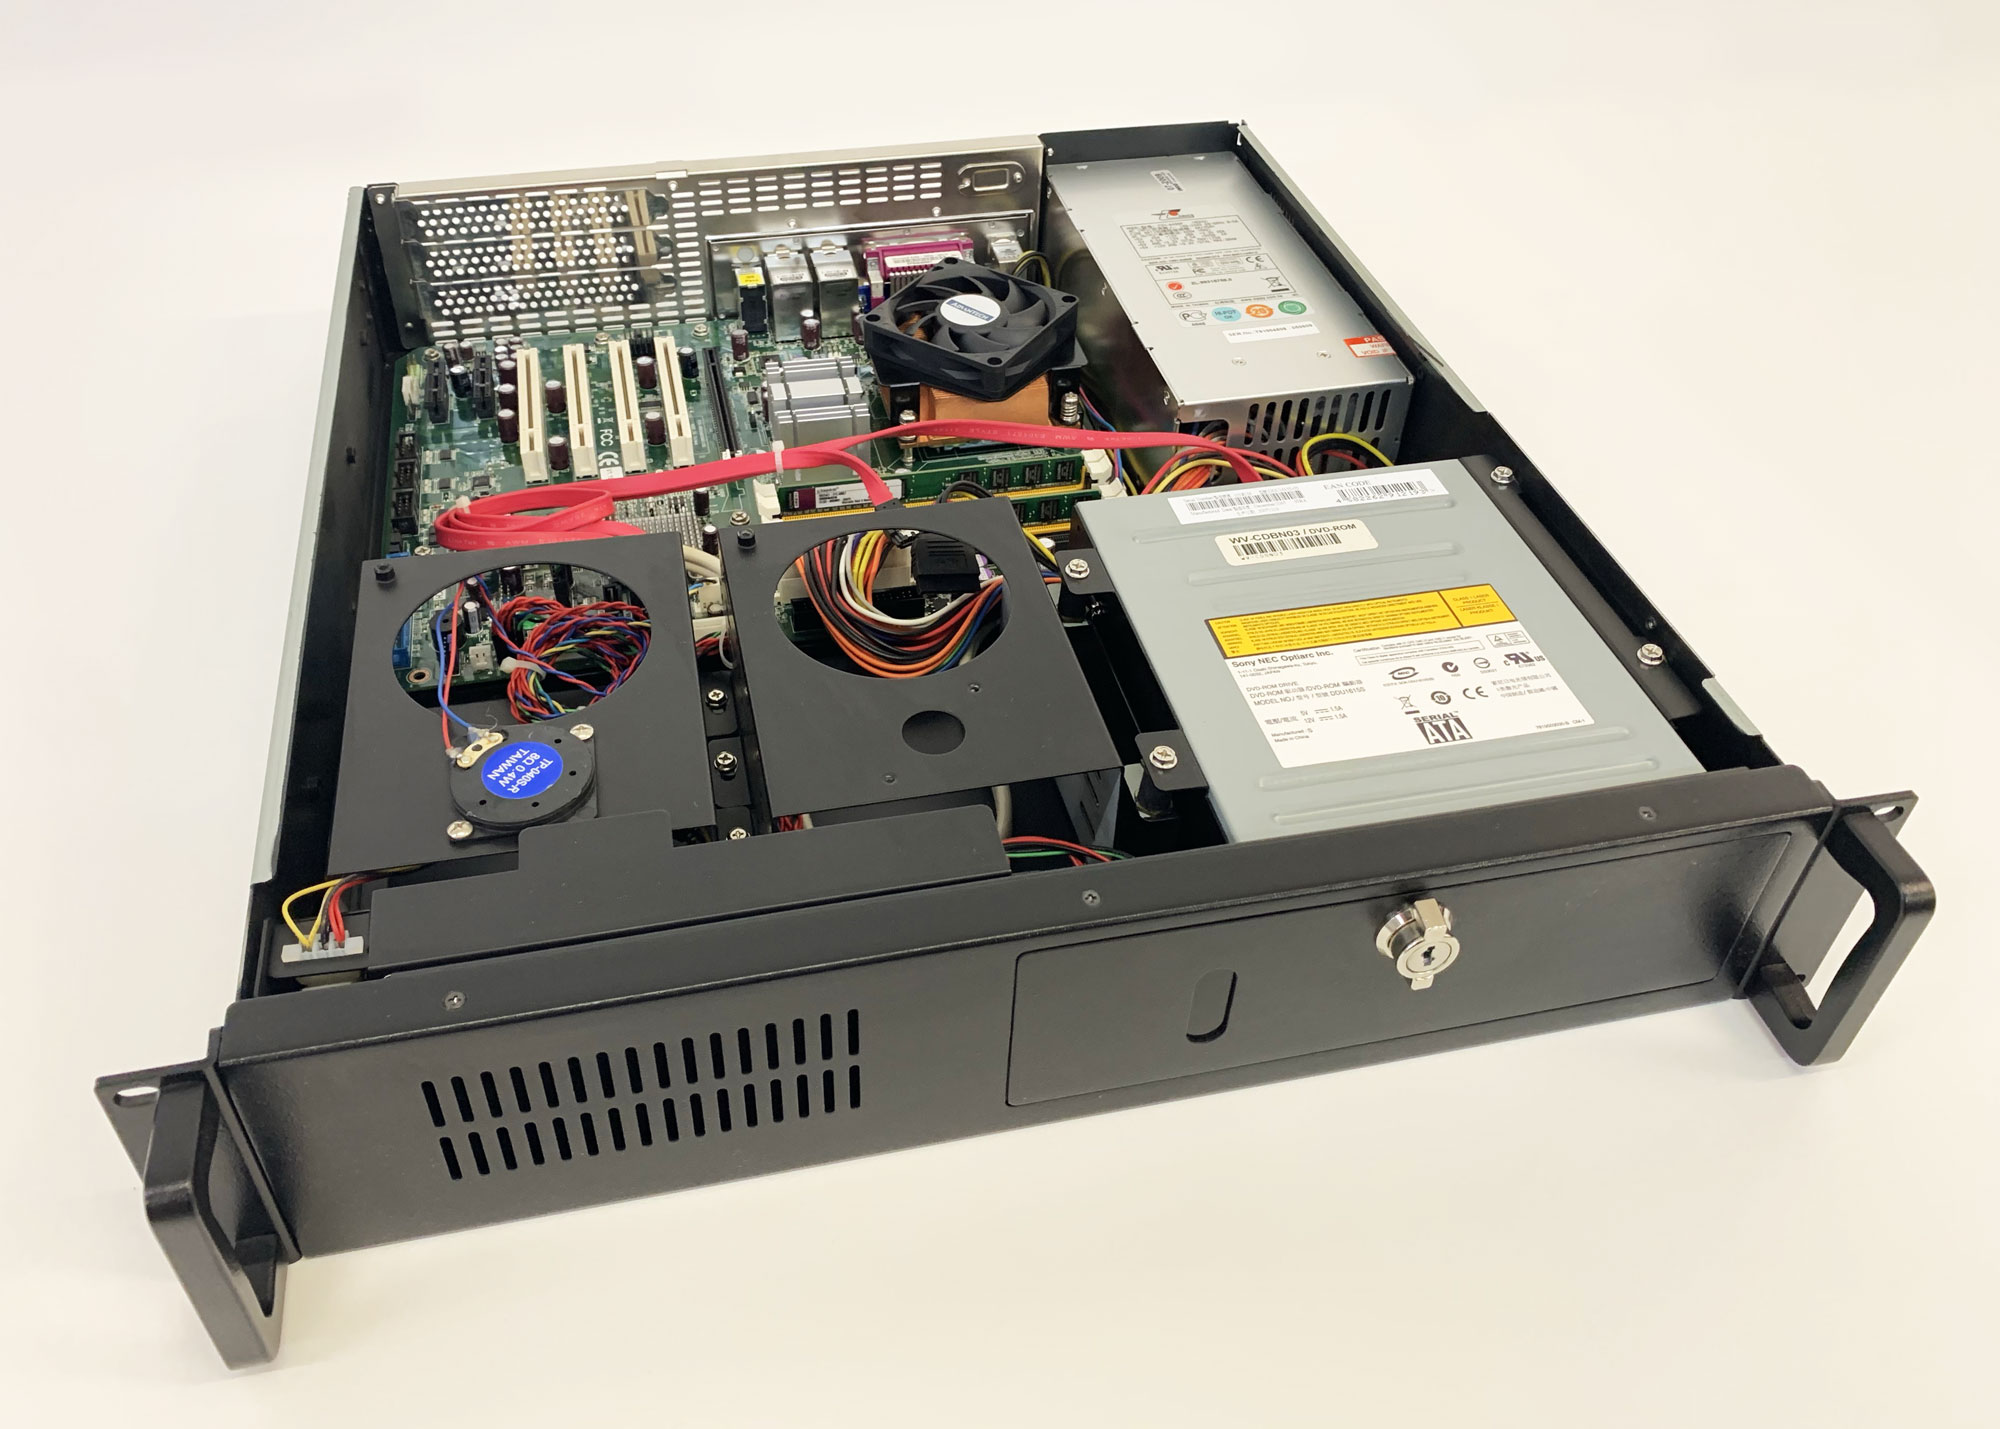 2HE Industrie PC